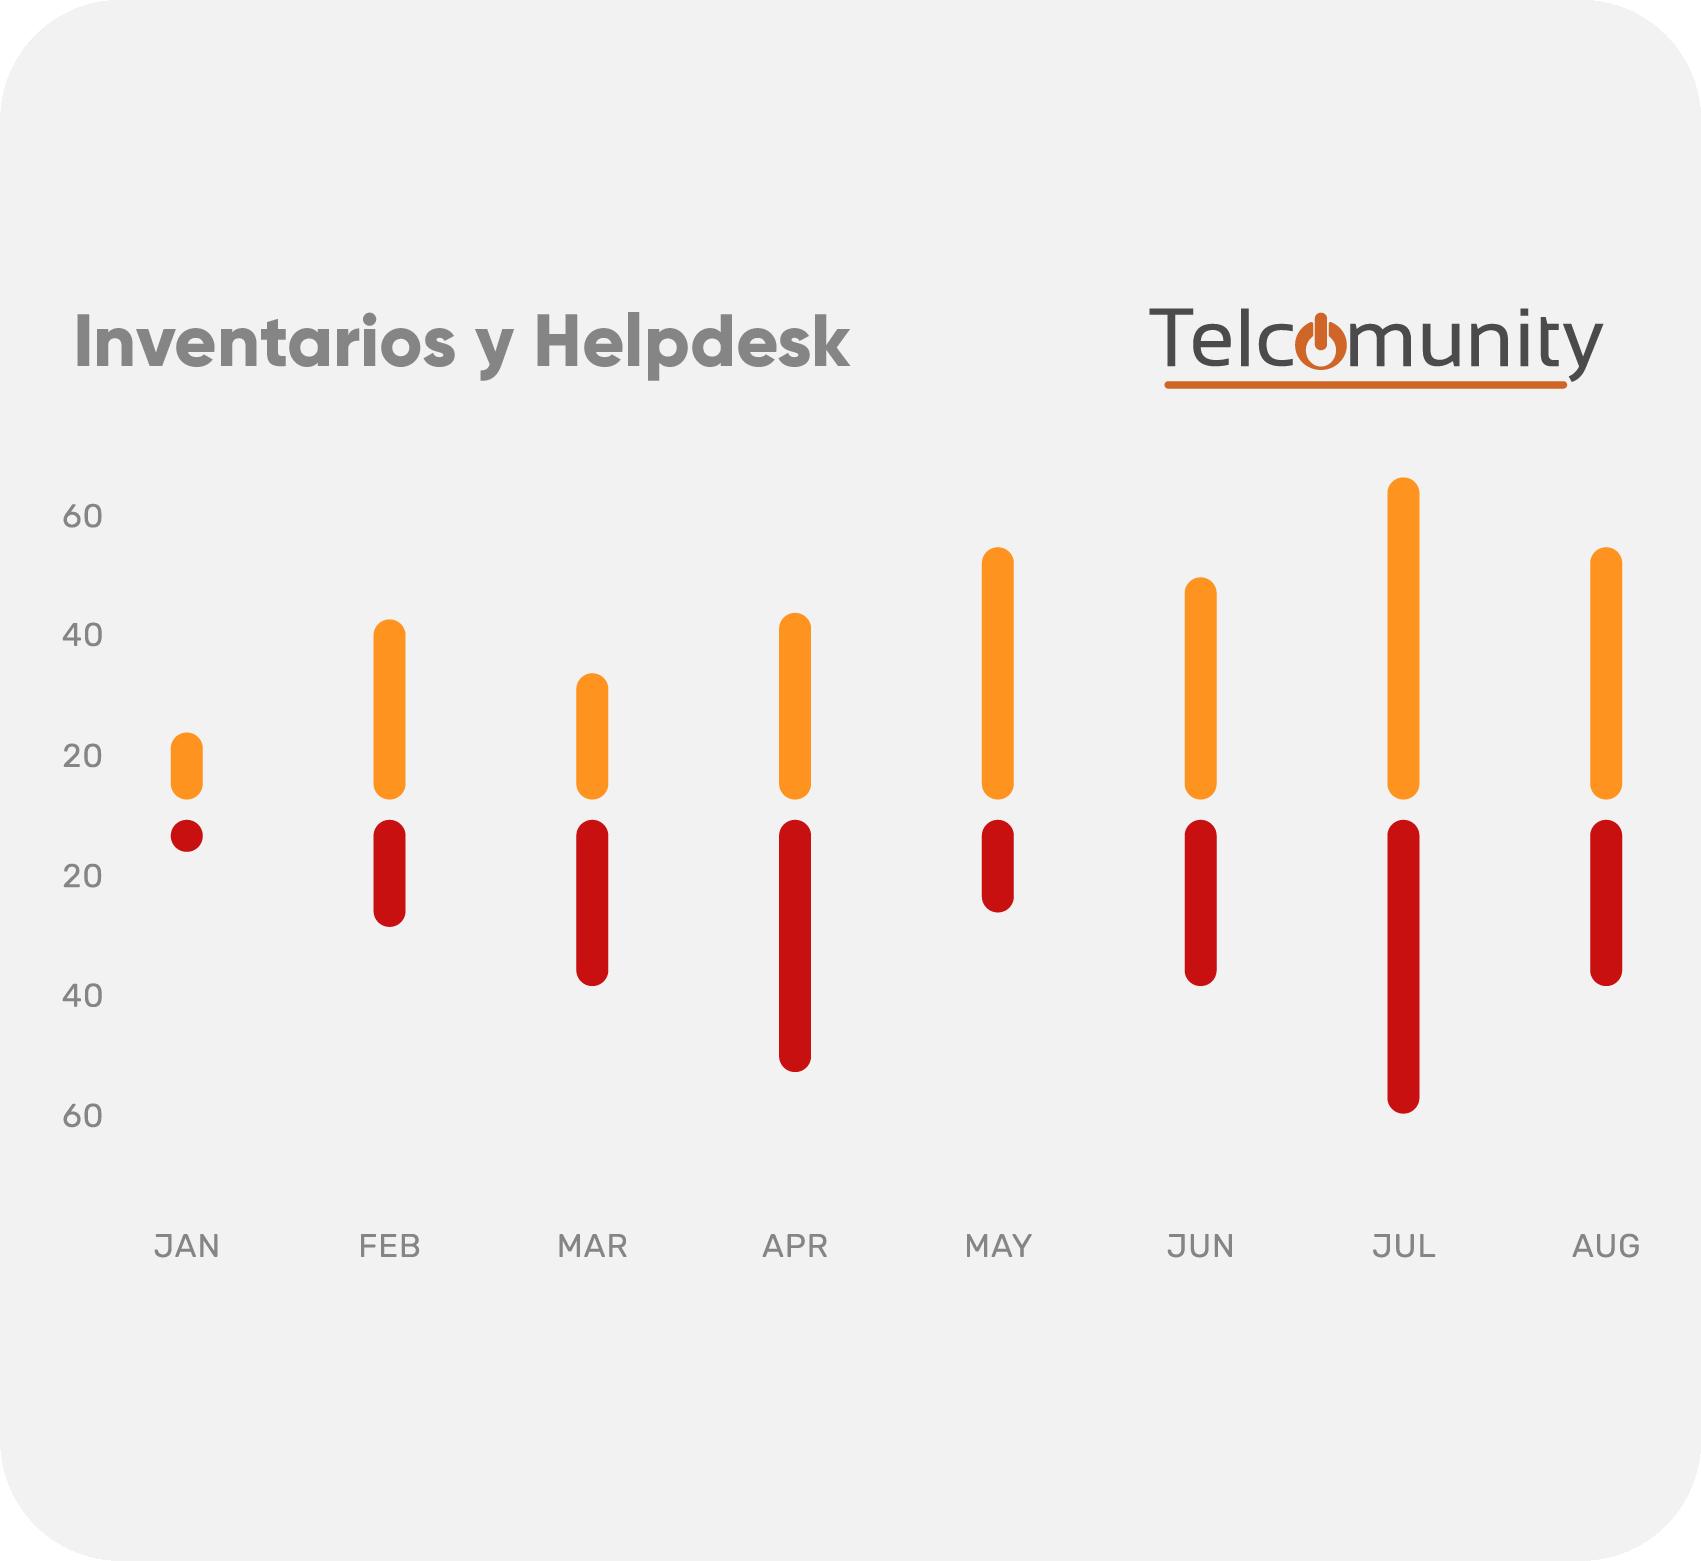 Telcomunity